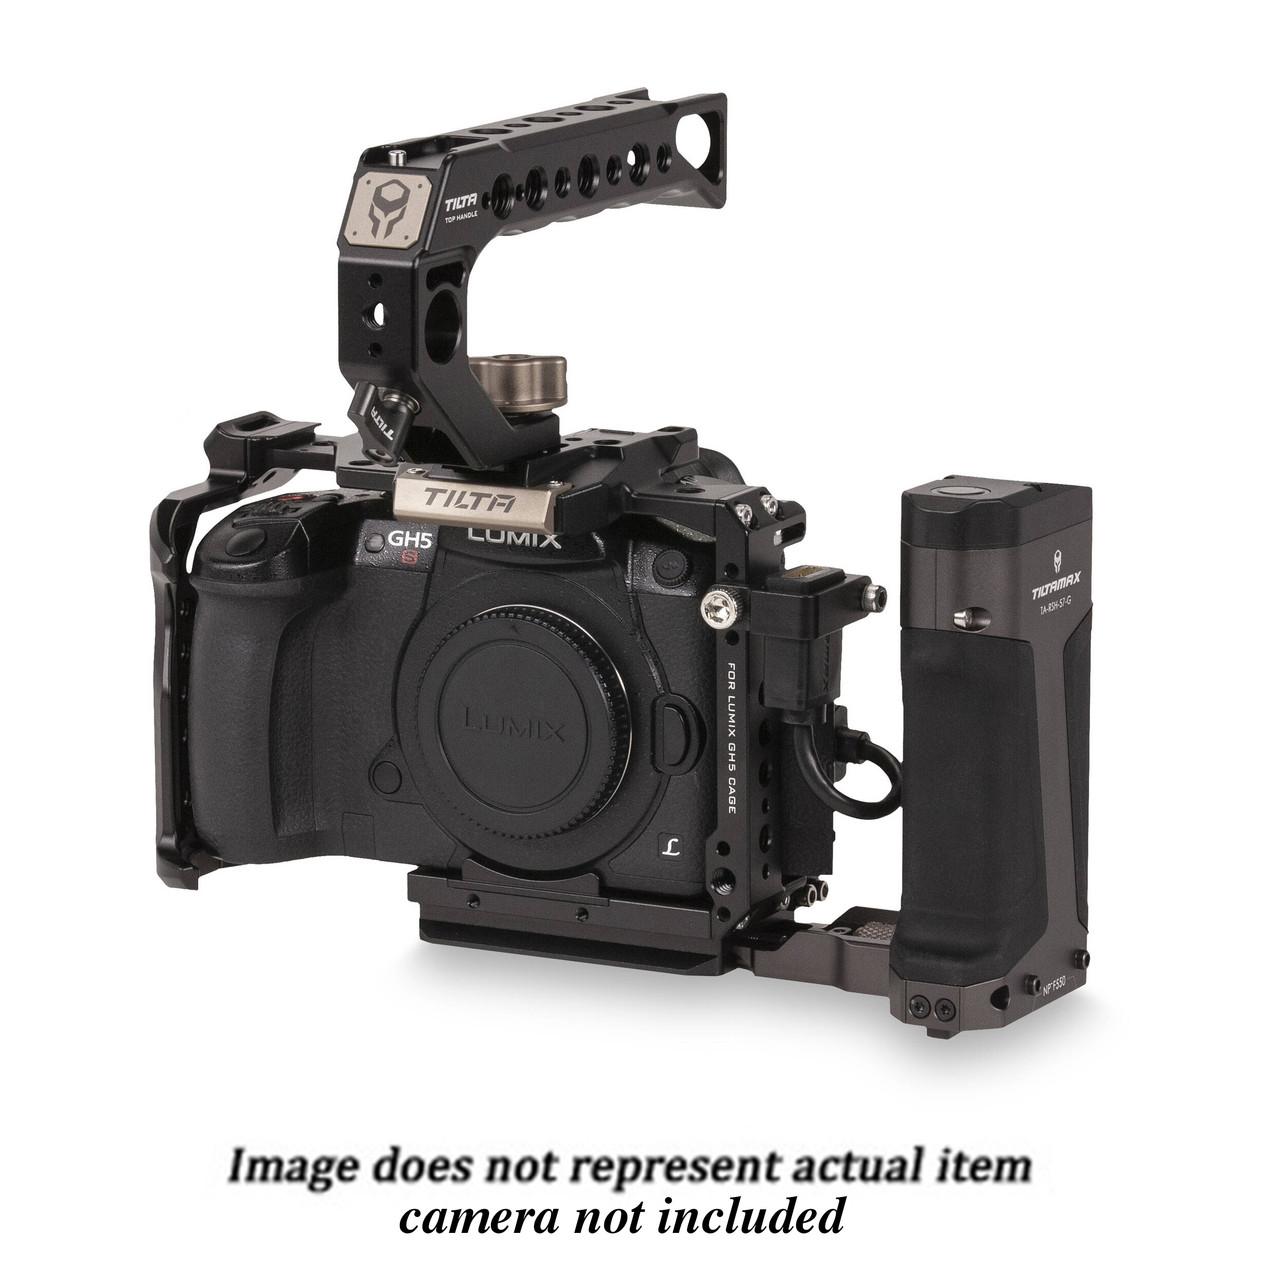 Tilta Tiltaing Panasonic GH Series Cage Kit B Black (USED)